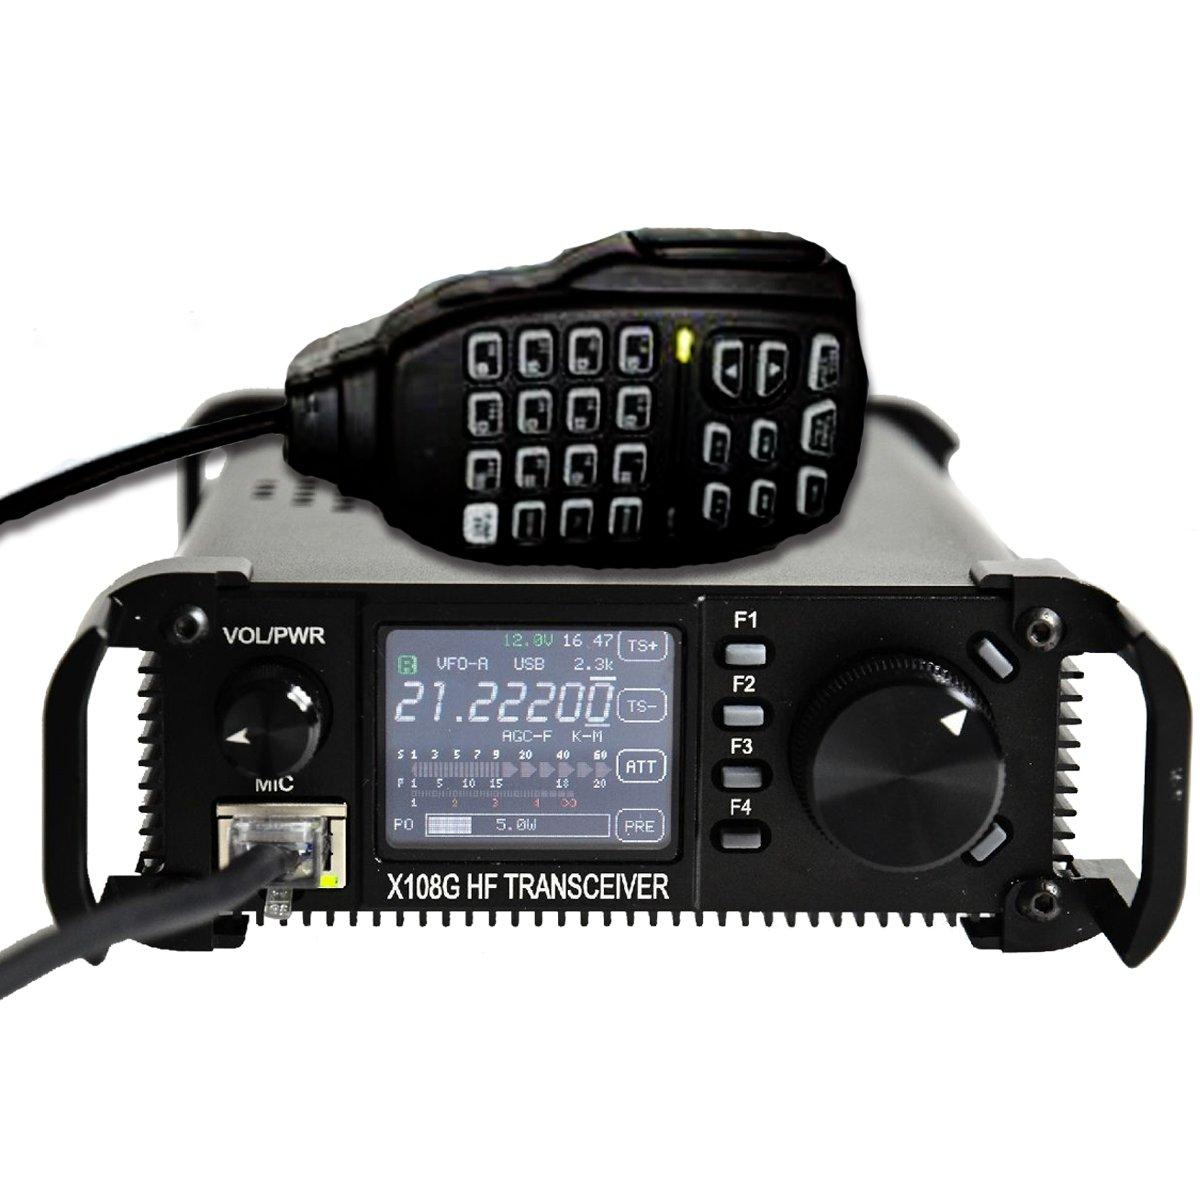 Xiegu X-108G QRP Transceiver Outdoor Version 9 Bands AM/SSB/CW 1-20 watts Black by Xiegu (Image #9)